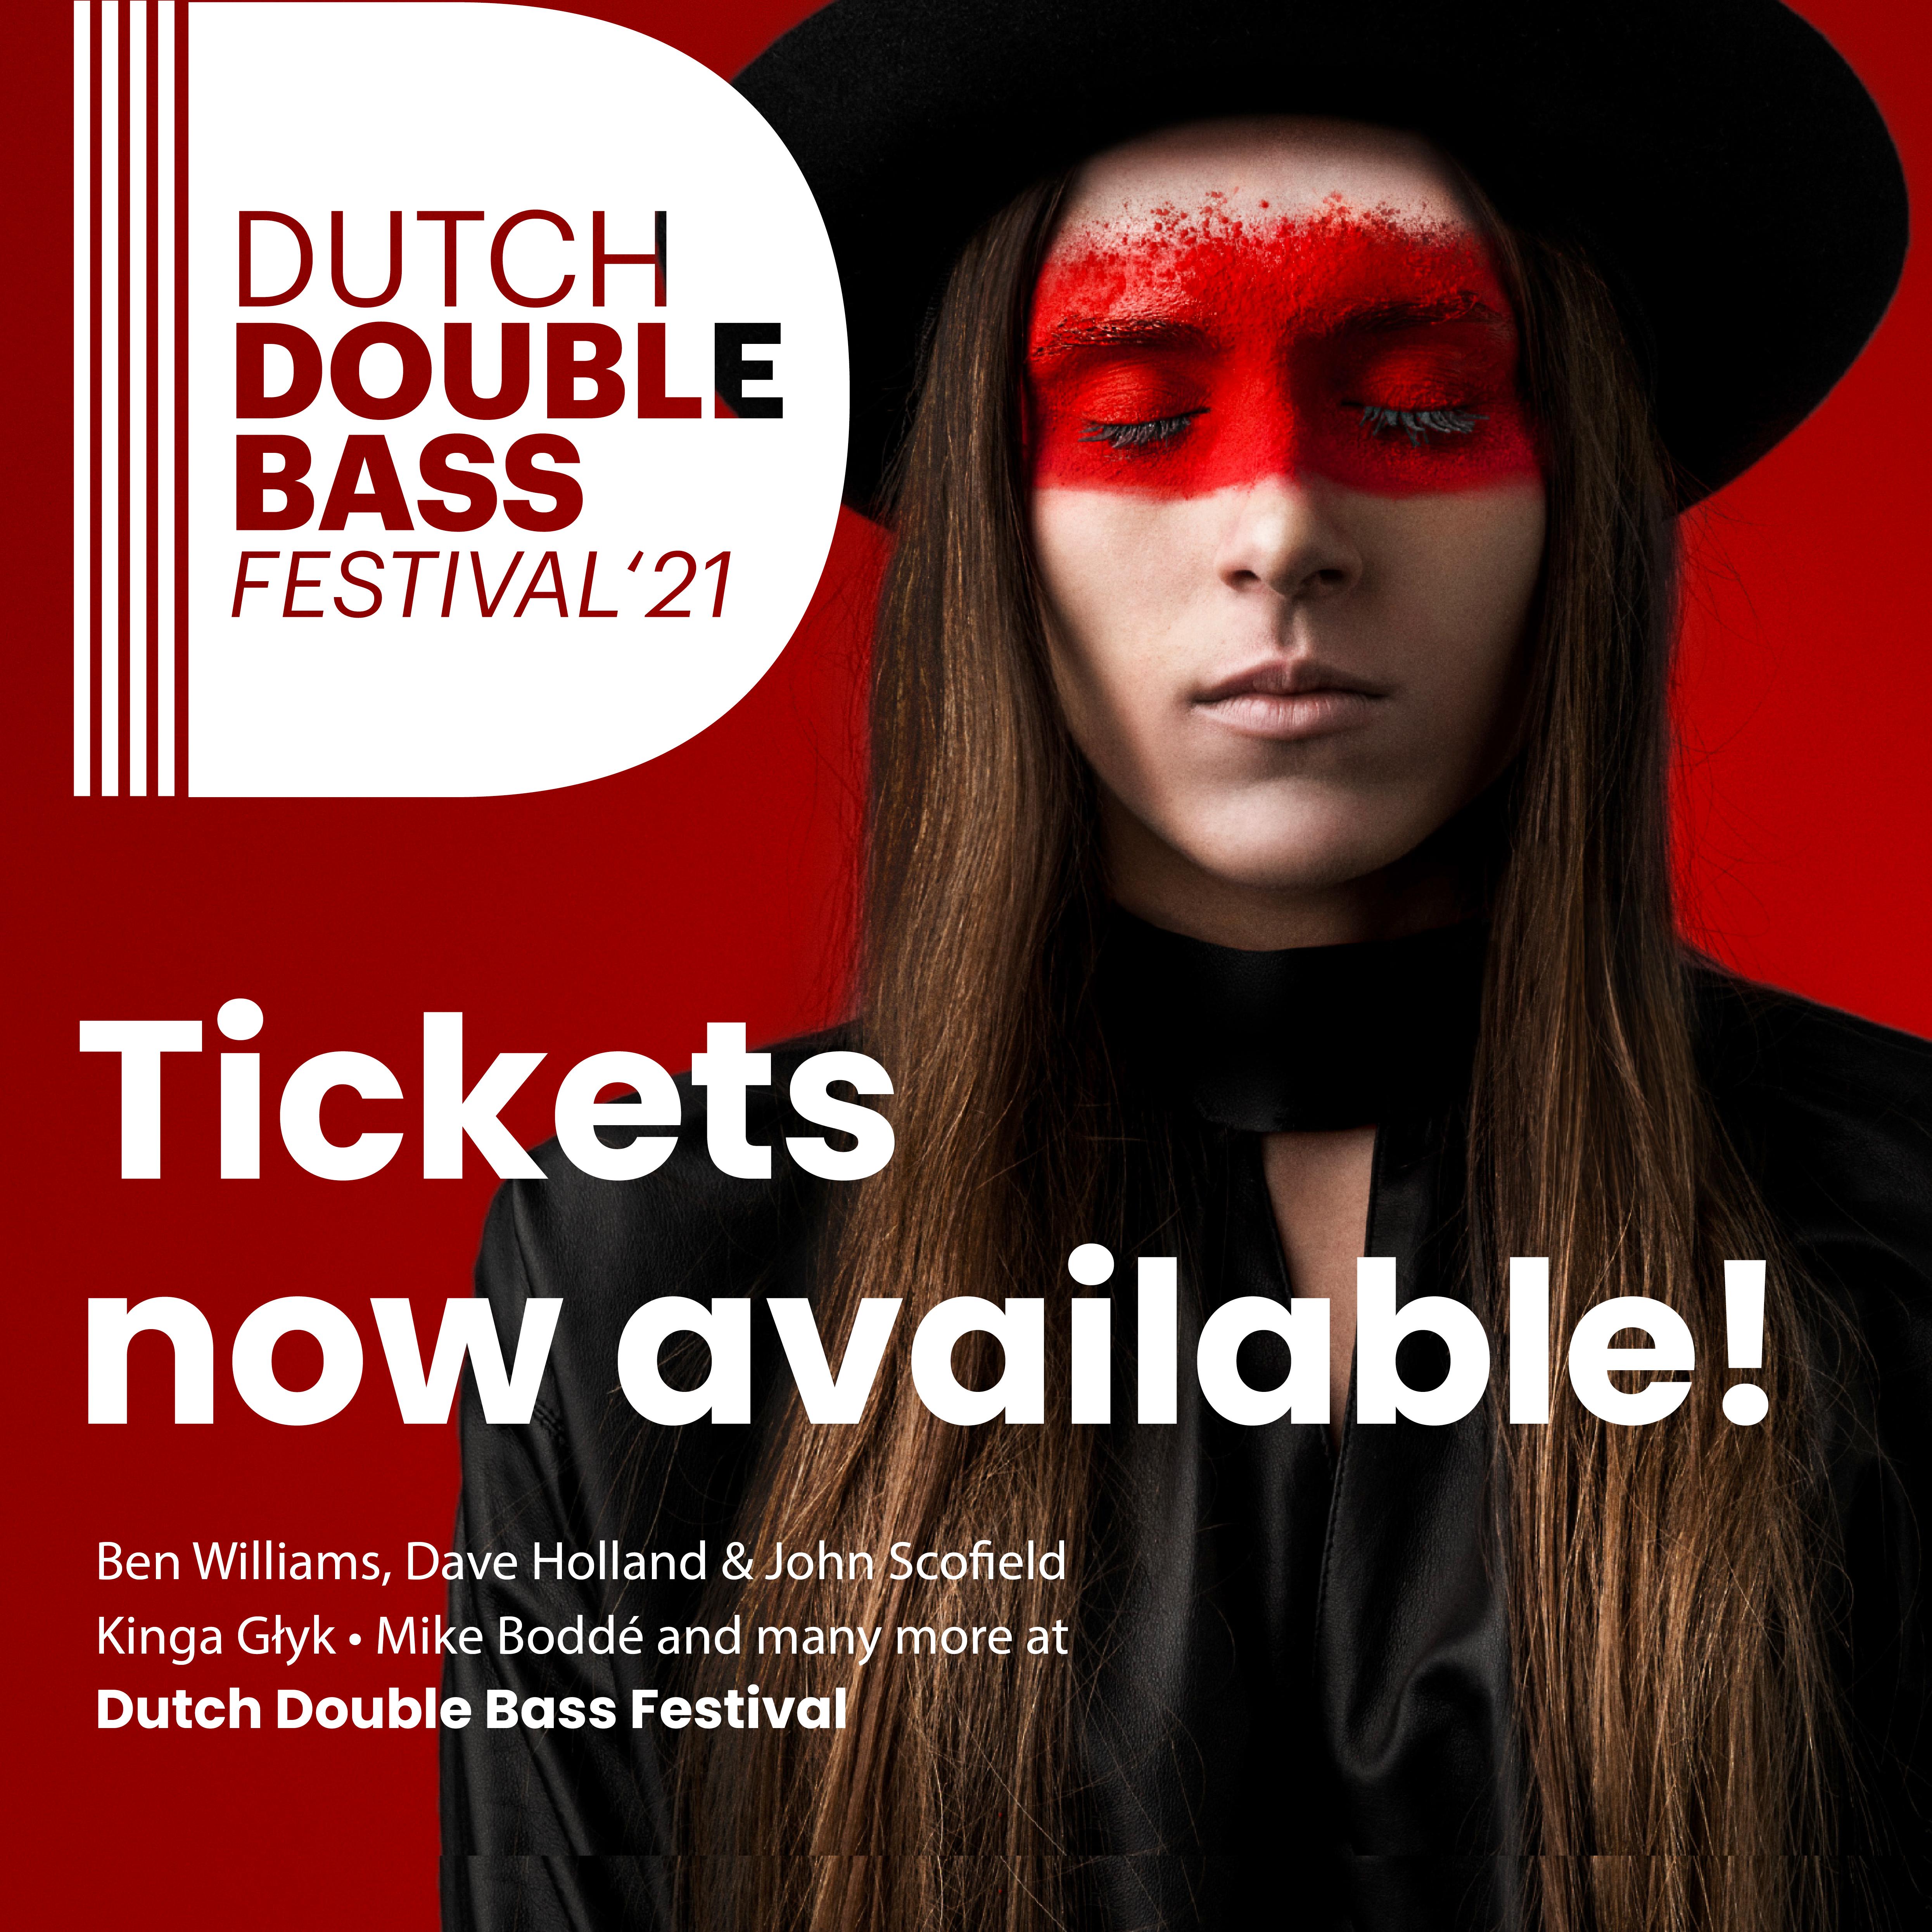 Dutch Double Bass Festival 2021